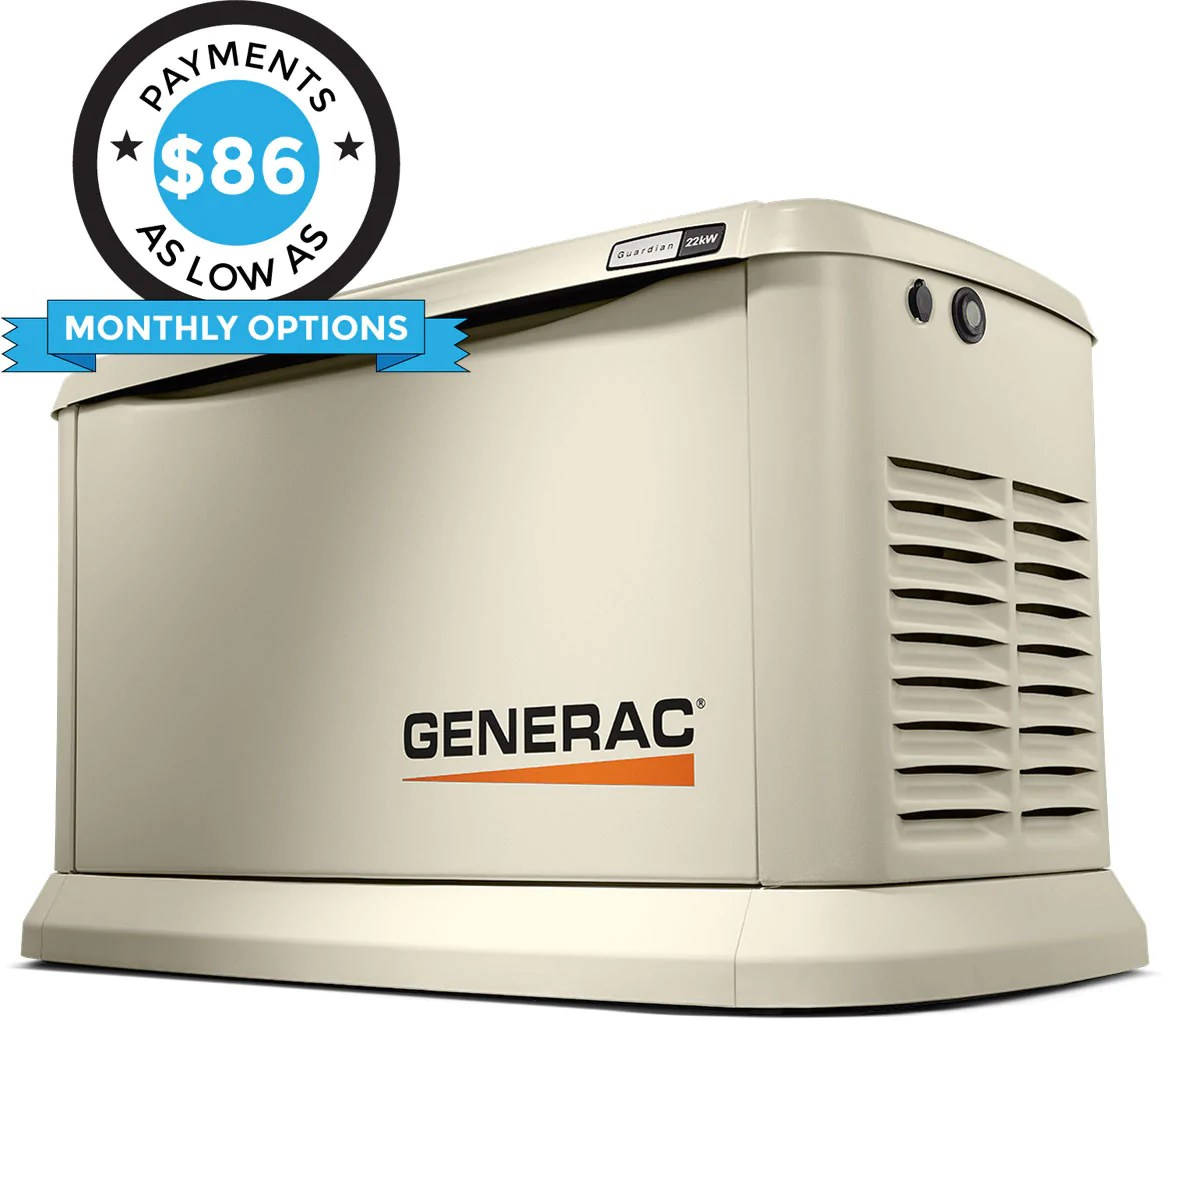 medium resolution of generac guardian 7042 22kw aluminum automatic standby generator